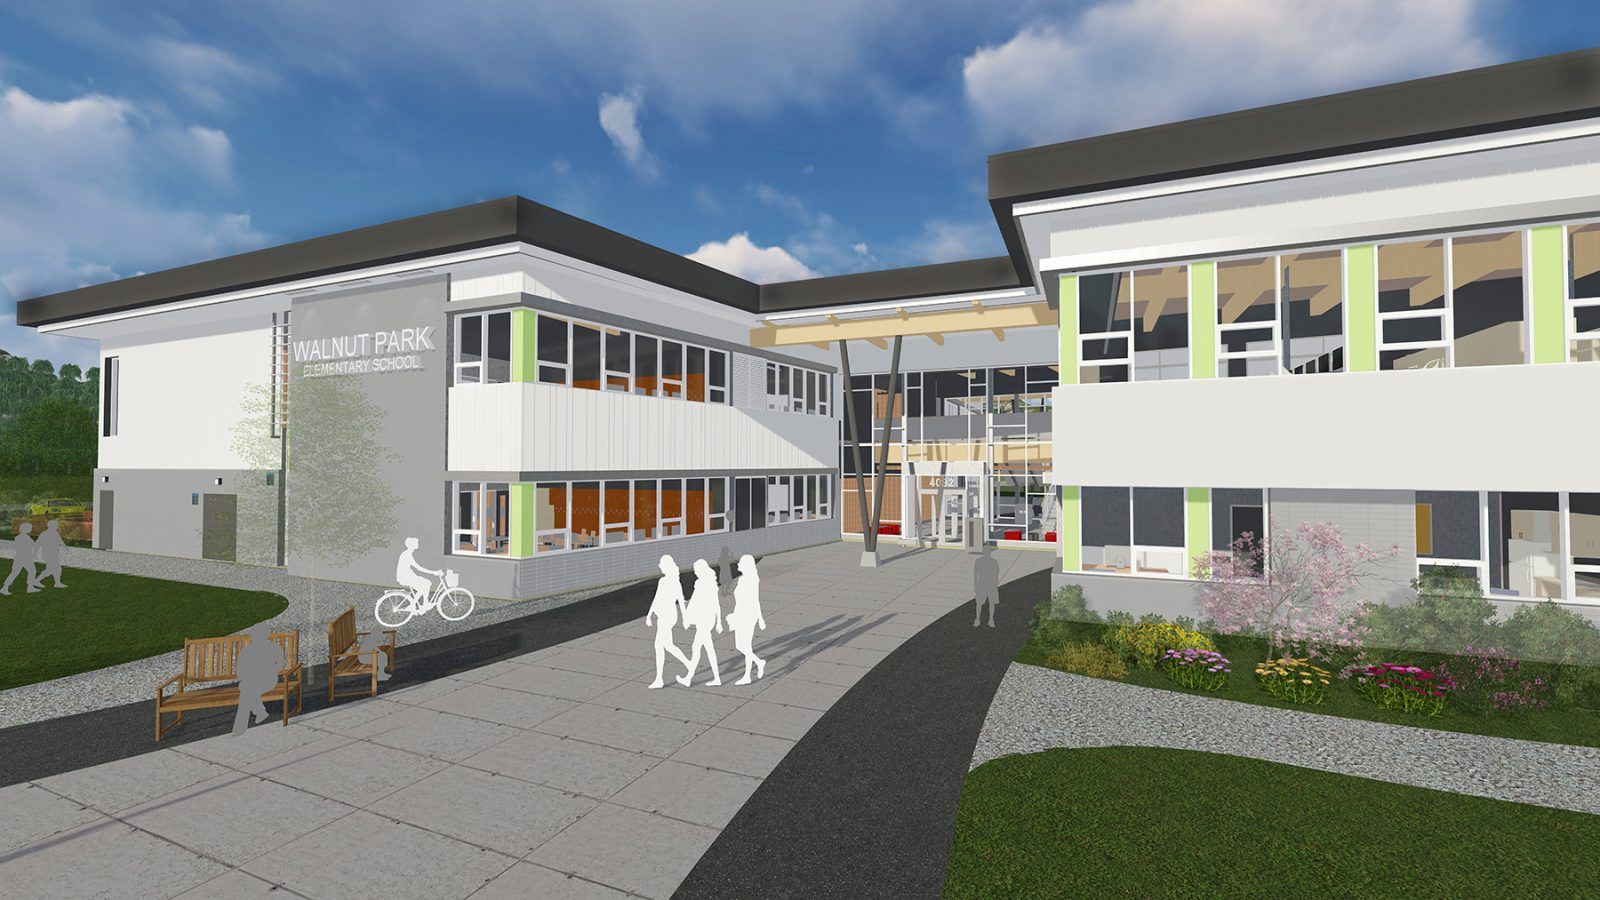 Walnut Park Elementary School Rendering